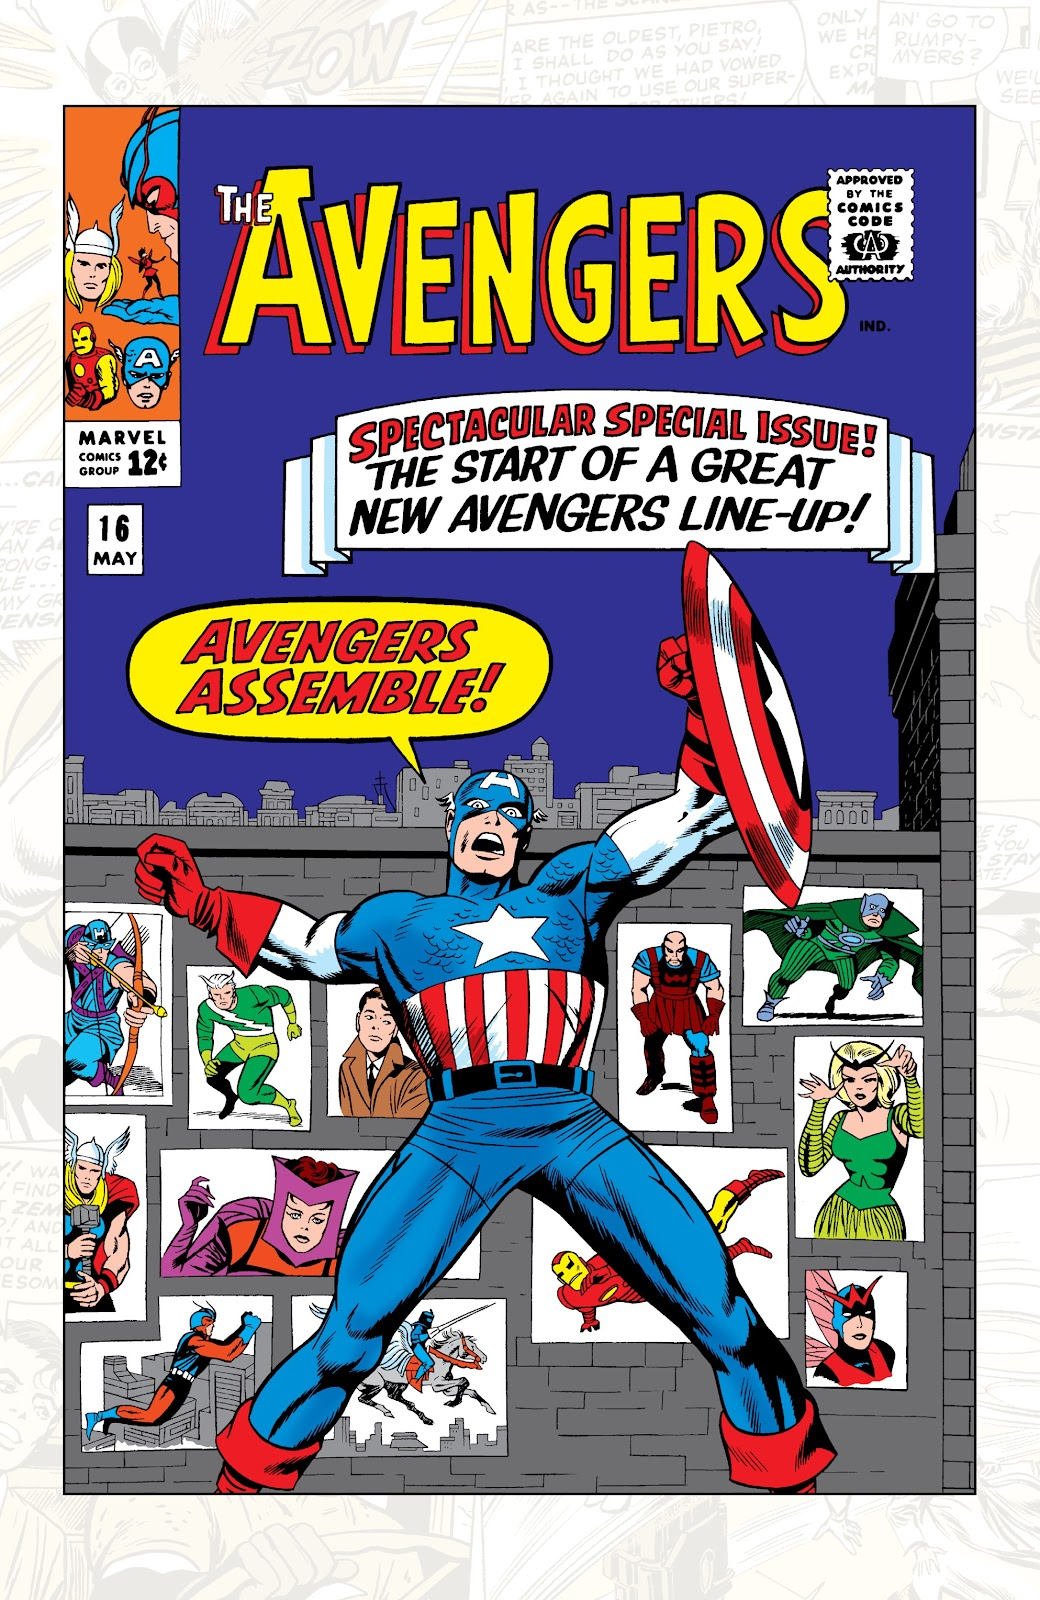 Read online Marvel Tales: Avengers comic -  Issue # Full - 5